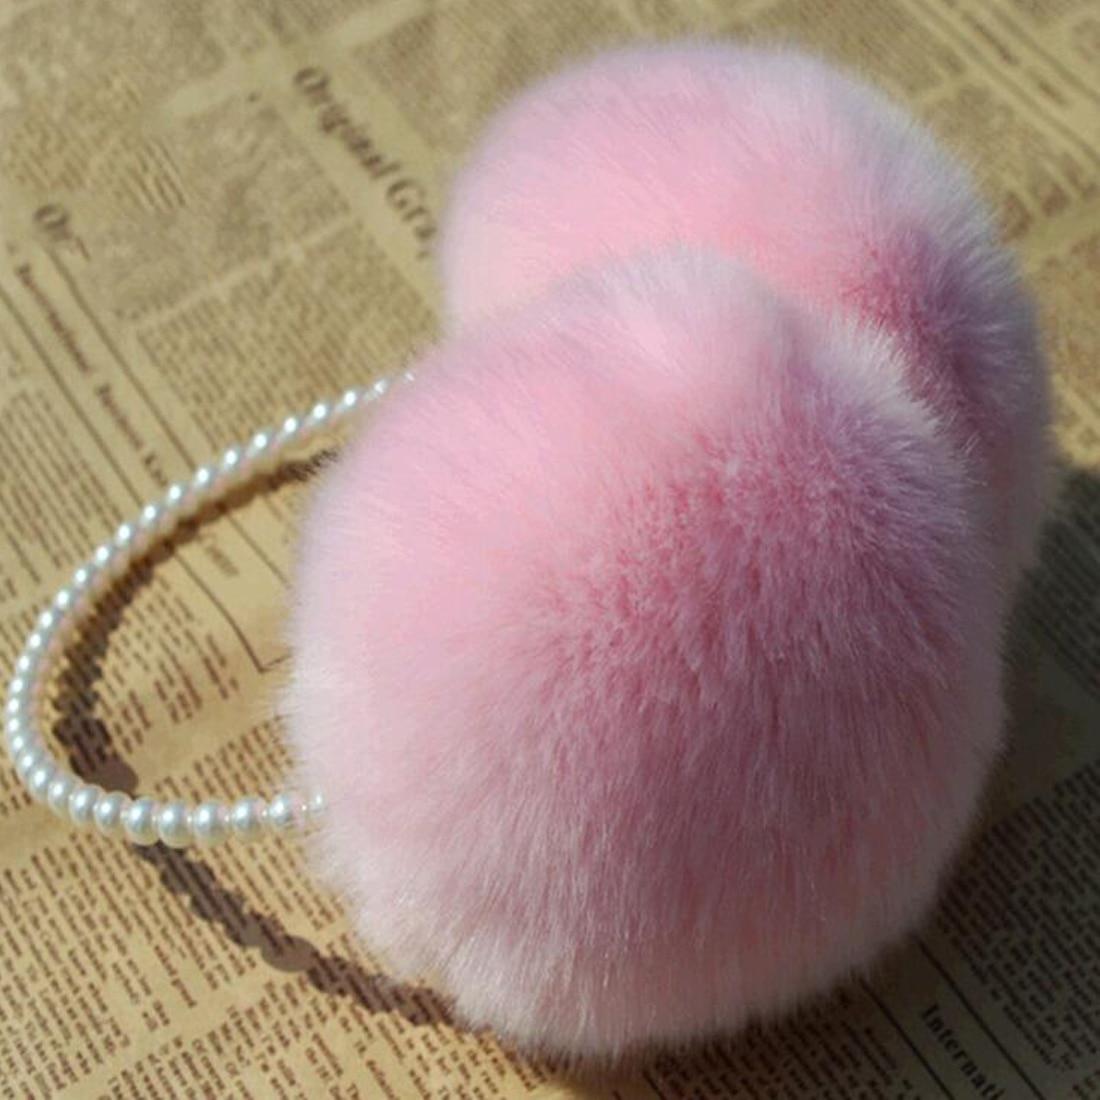 Rabbit Fur Earmuffs Ear Muffs Ear Warmers Earmuffs Earflap Winter Outdoor Women Warmer Headband Christmas Gifts